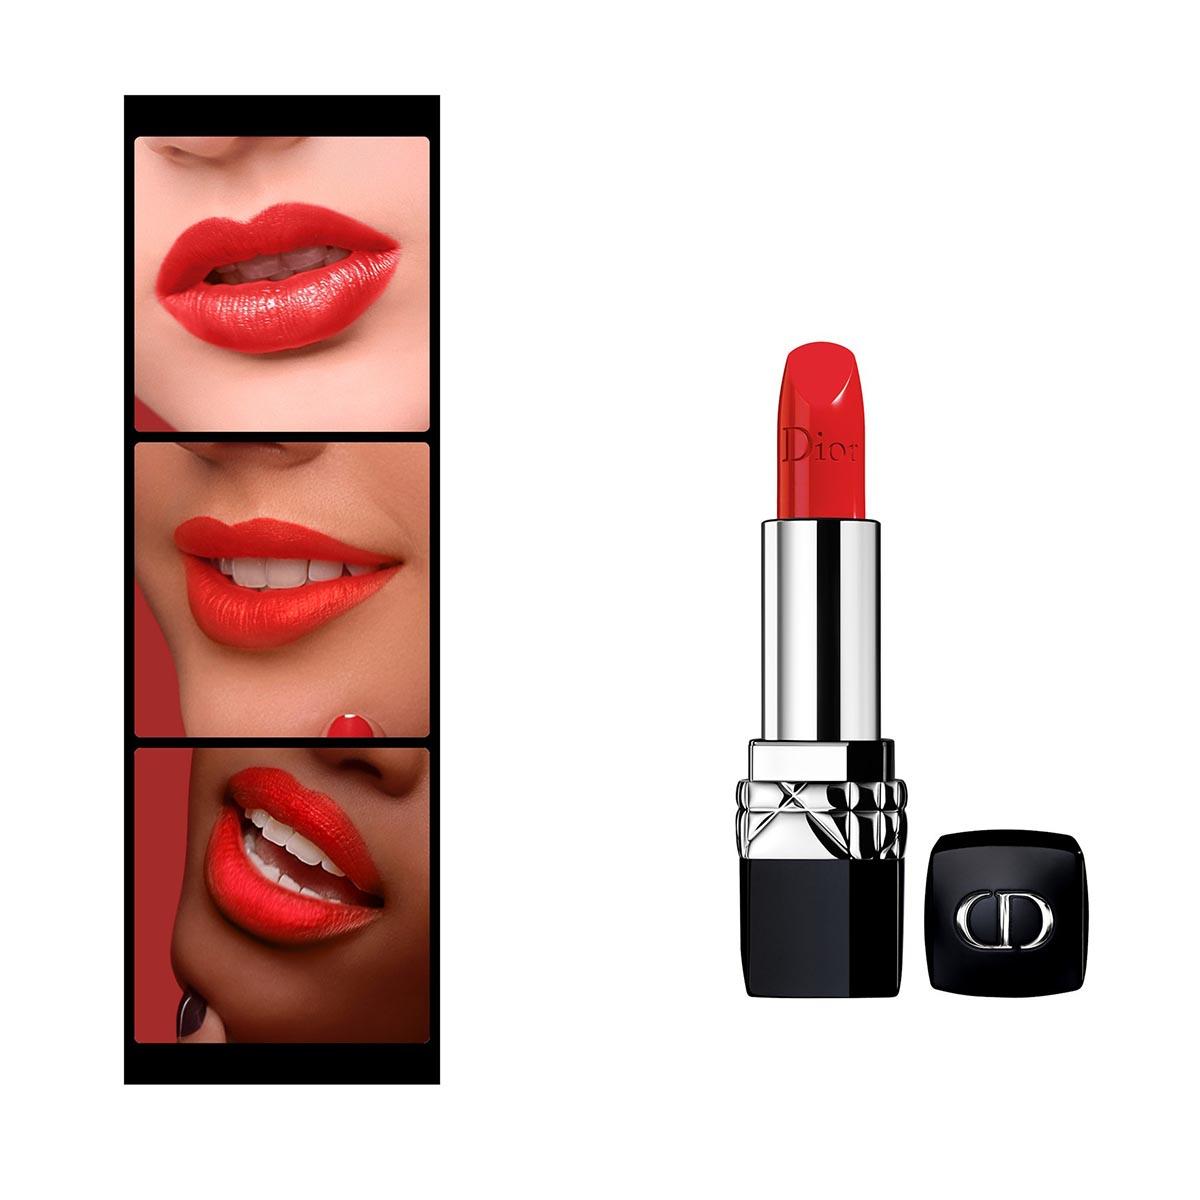 Dior rouge dior 844